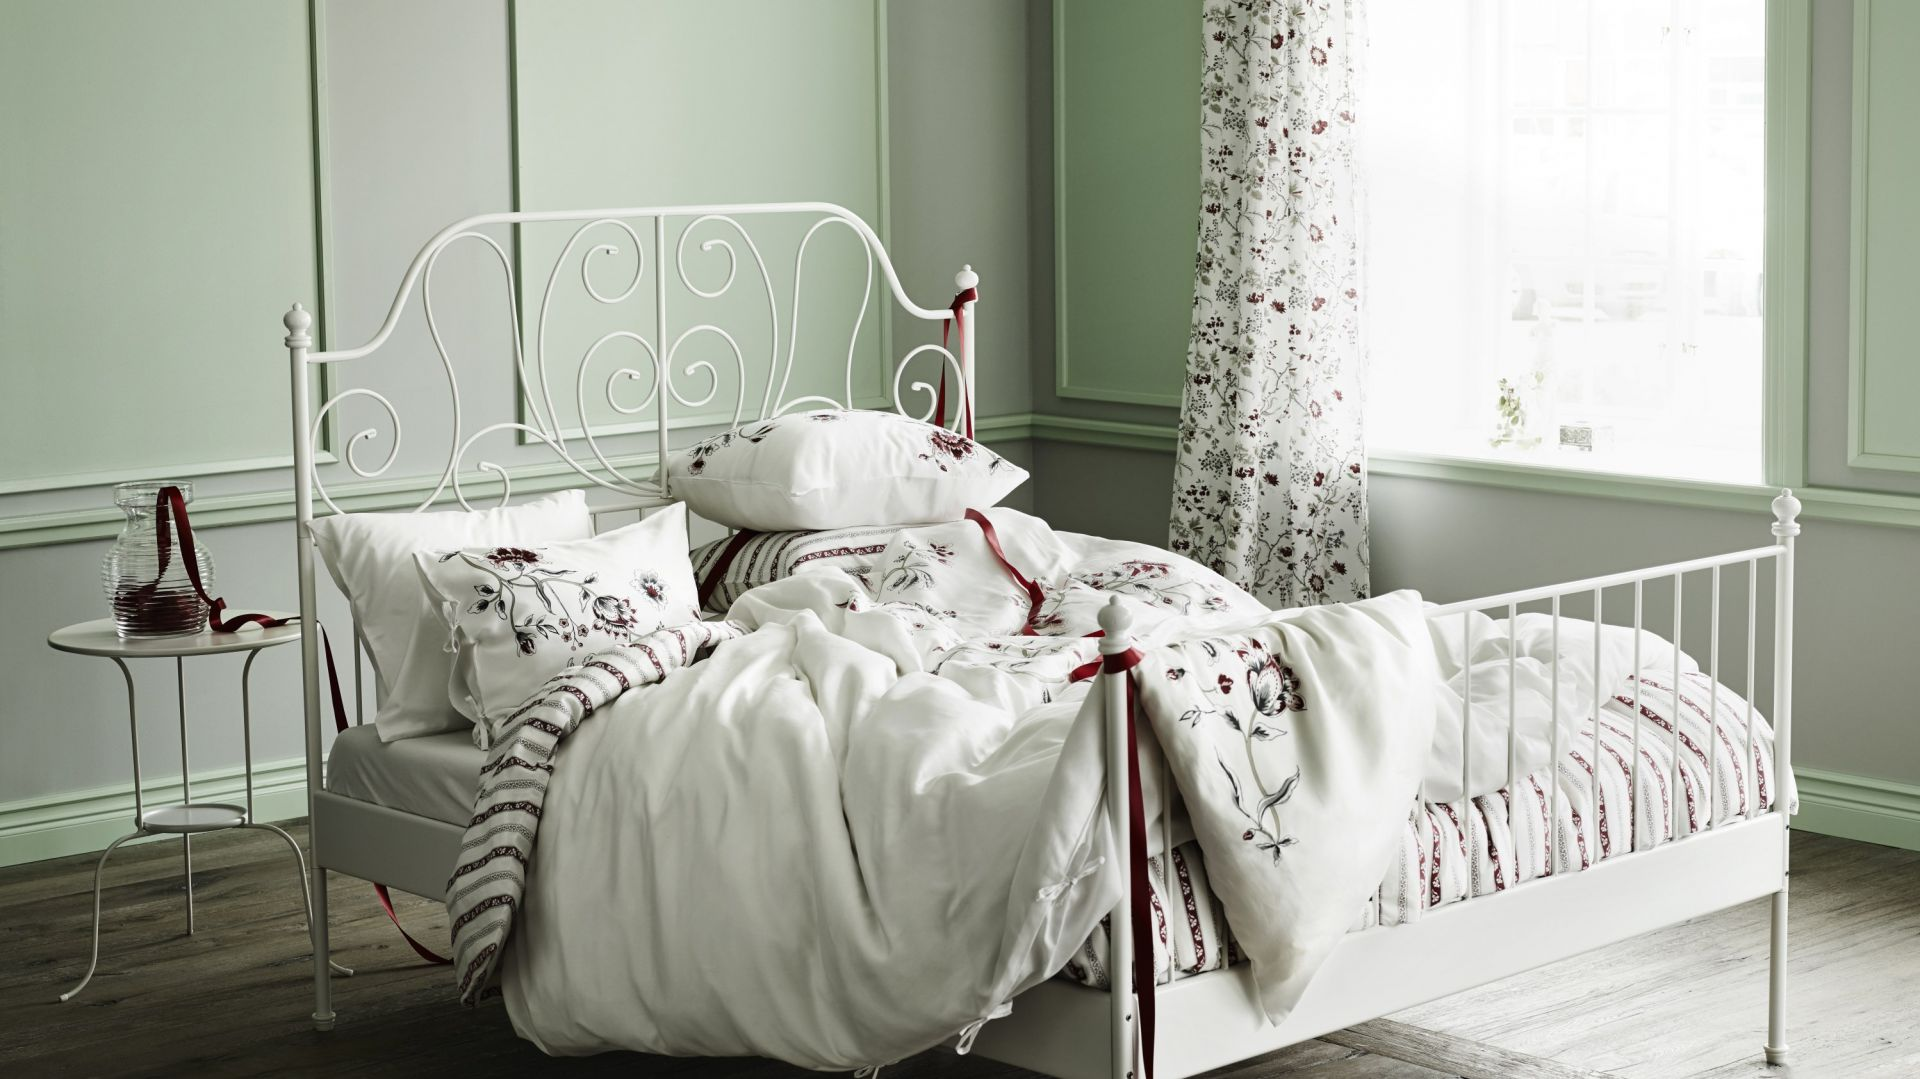 Polecamy Meble Do Sypialni Kute I Metalowe łóżka